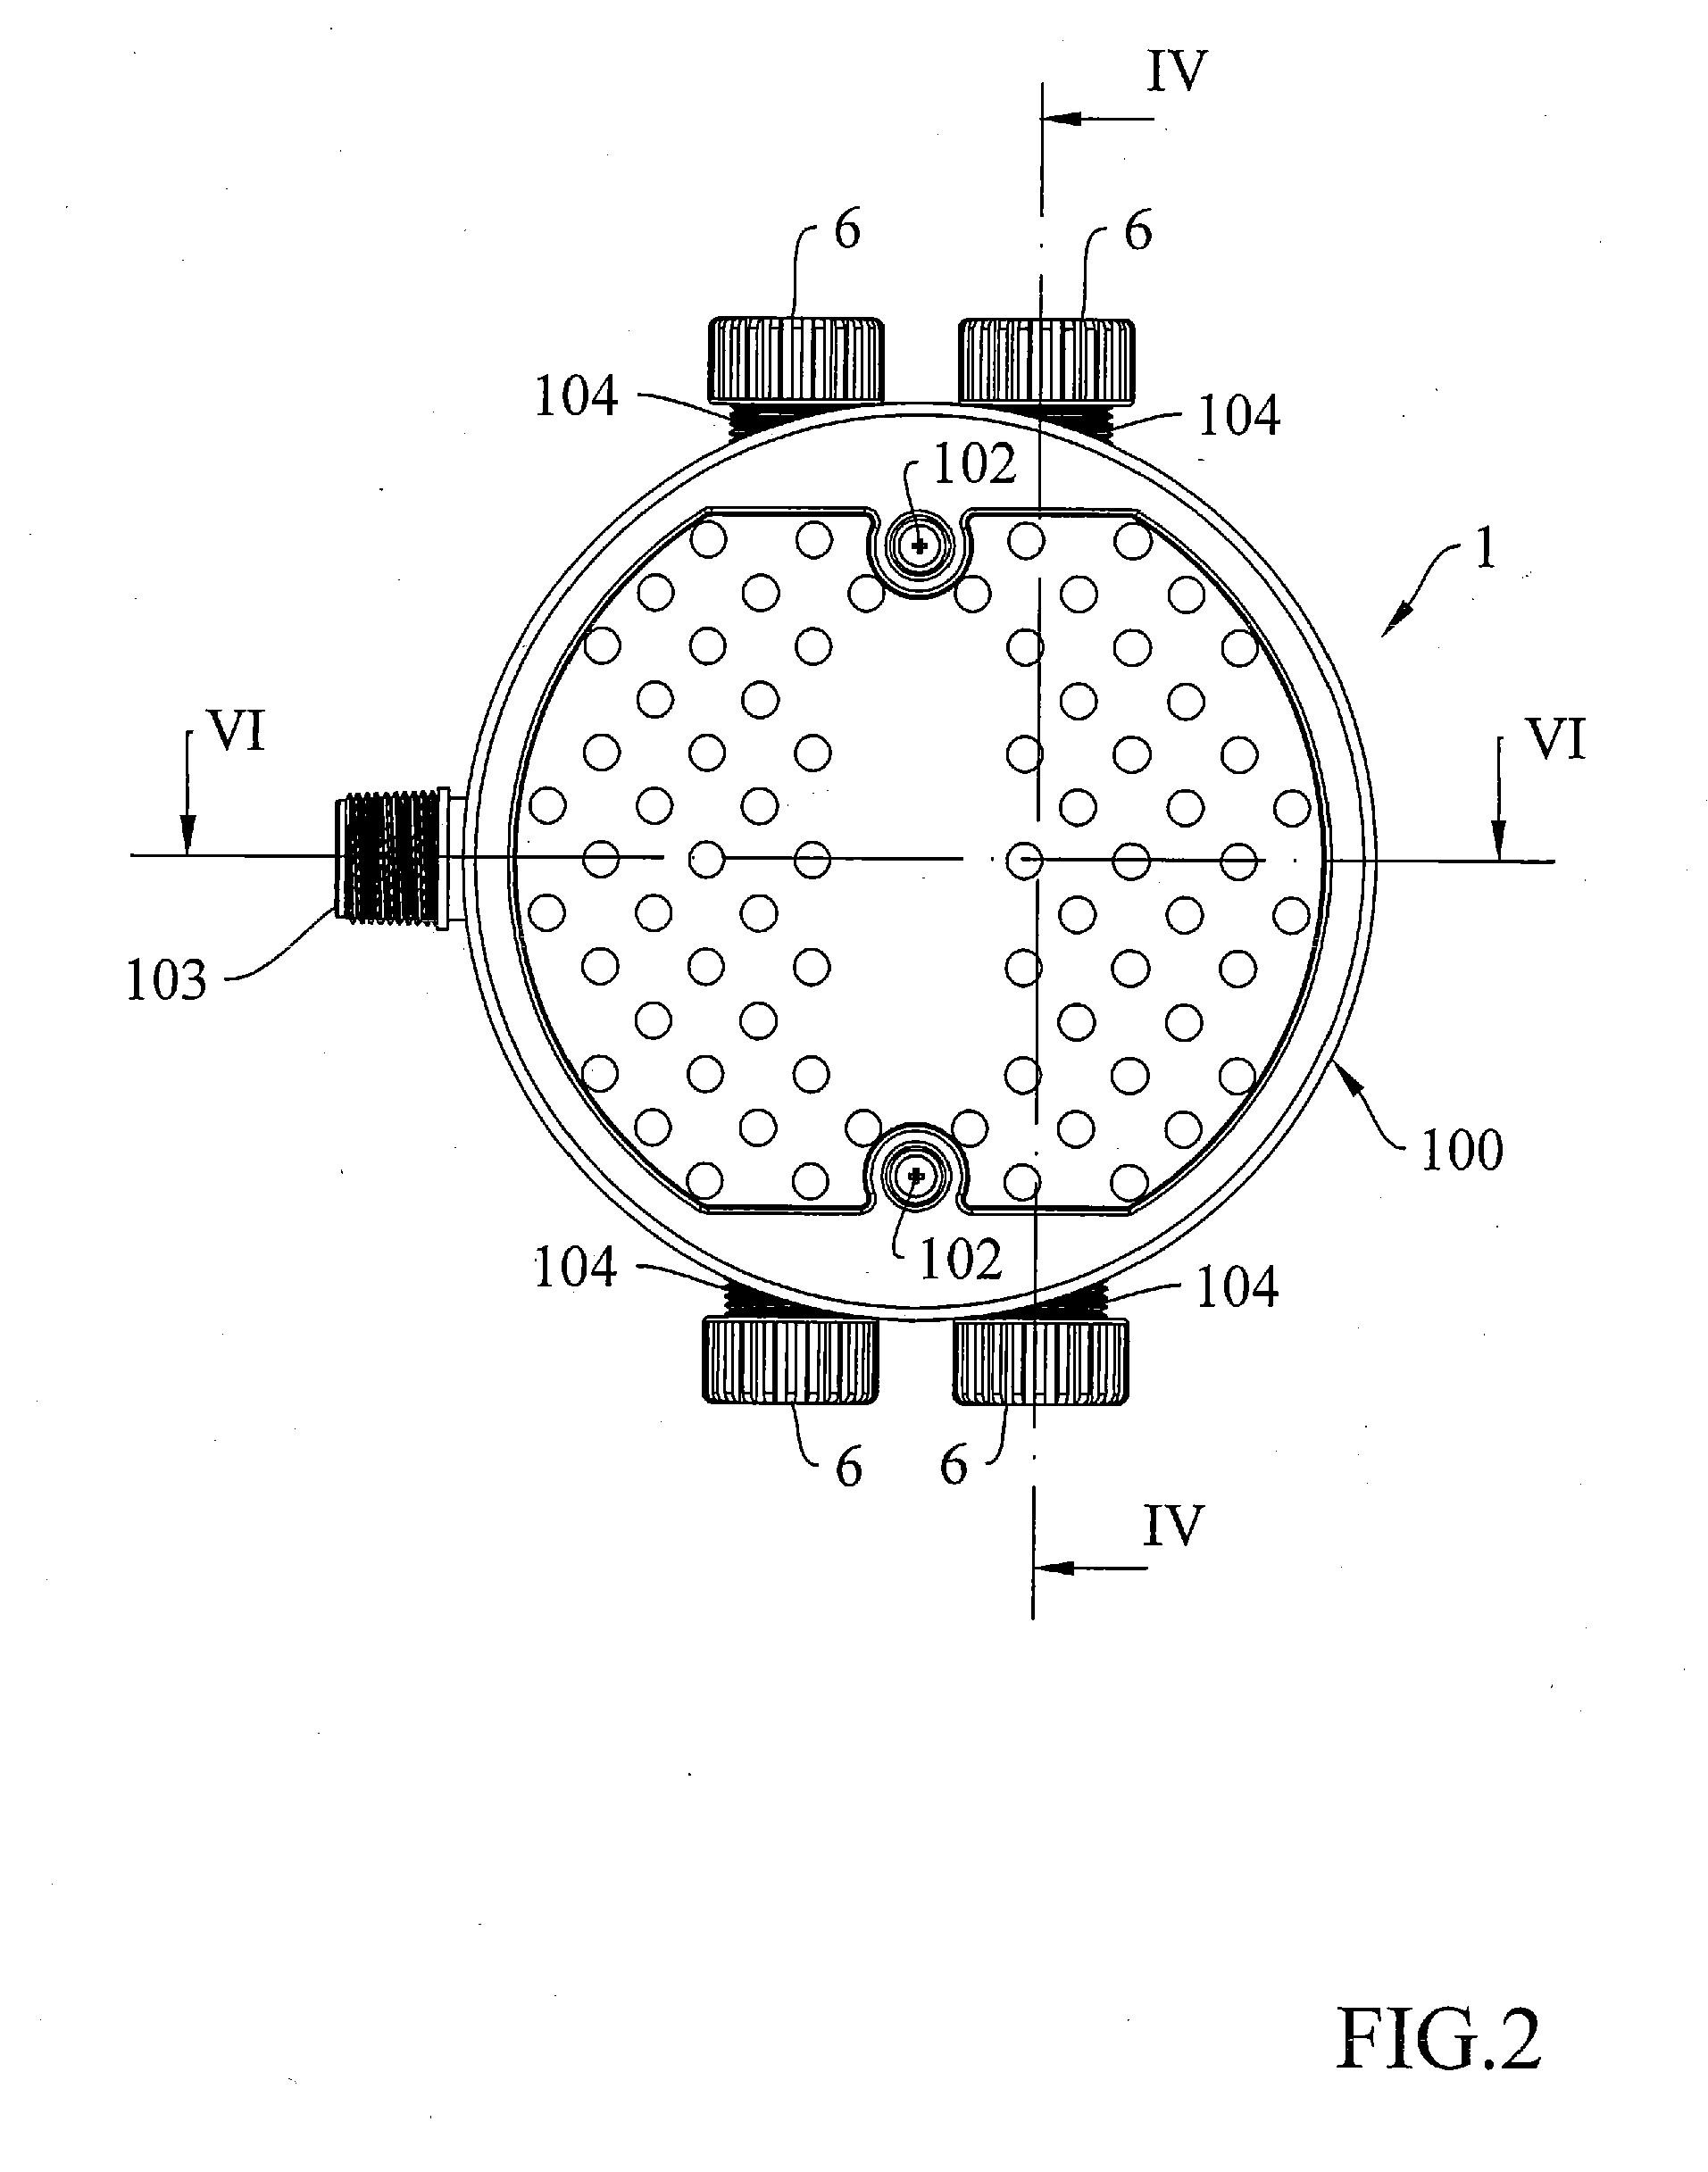 lawn sprinkler valve diagram rockford fosgate p2 wiring system plumbing imageresizertool com